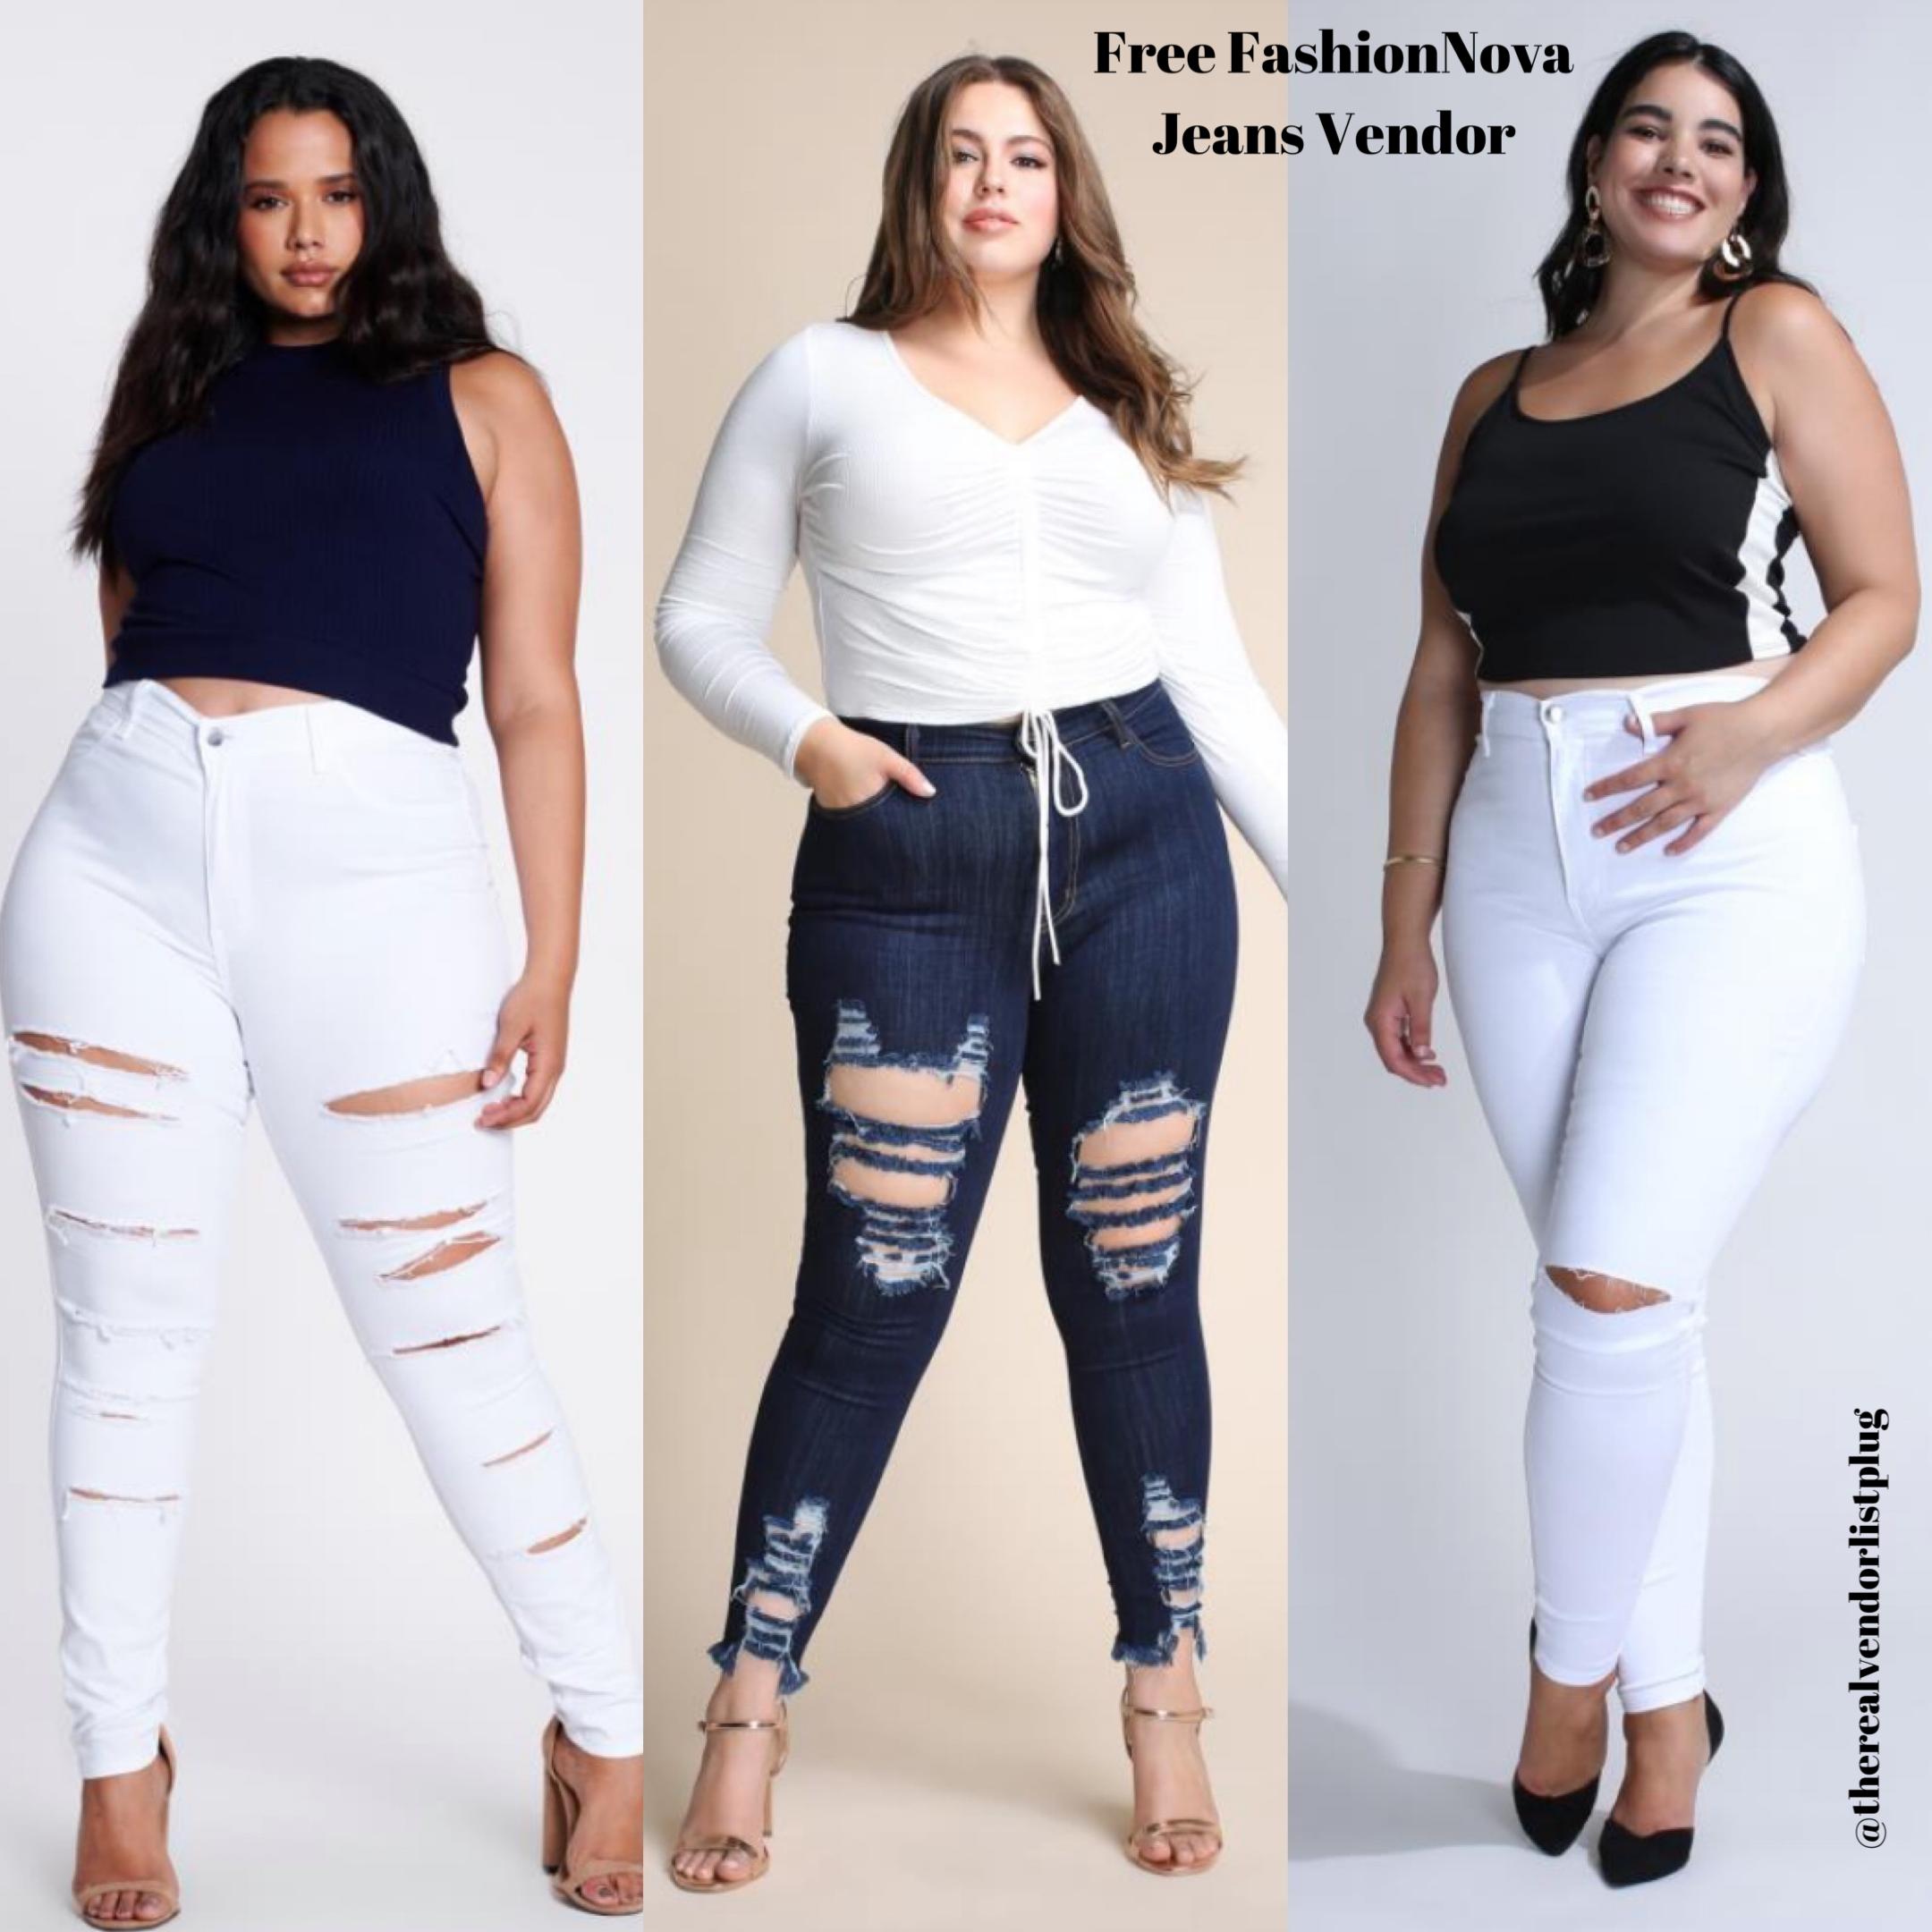 Pin by The Real Vendor List Plug on Free fashion Nova